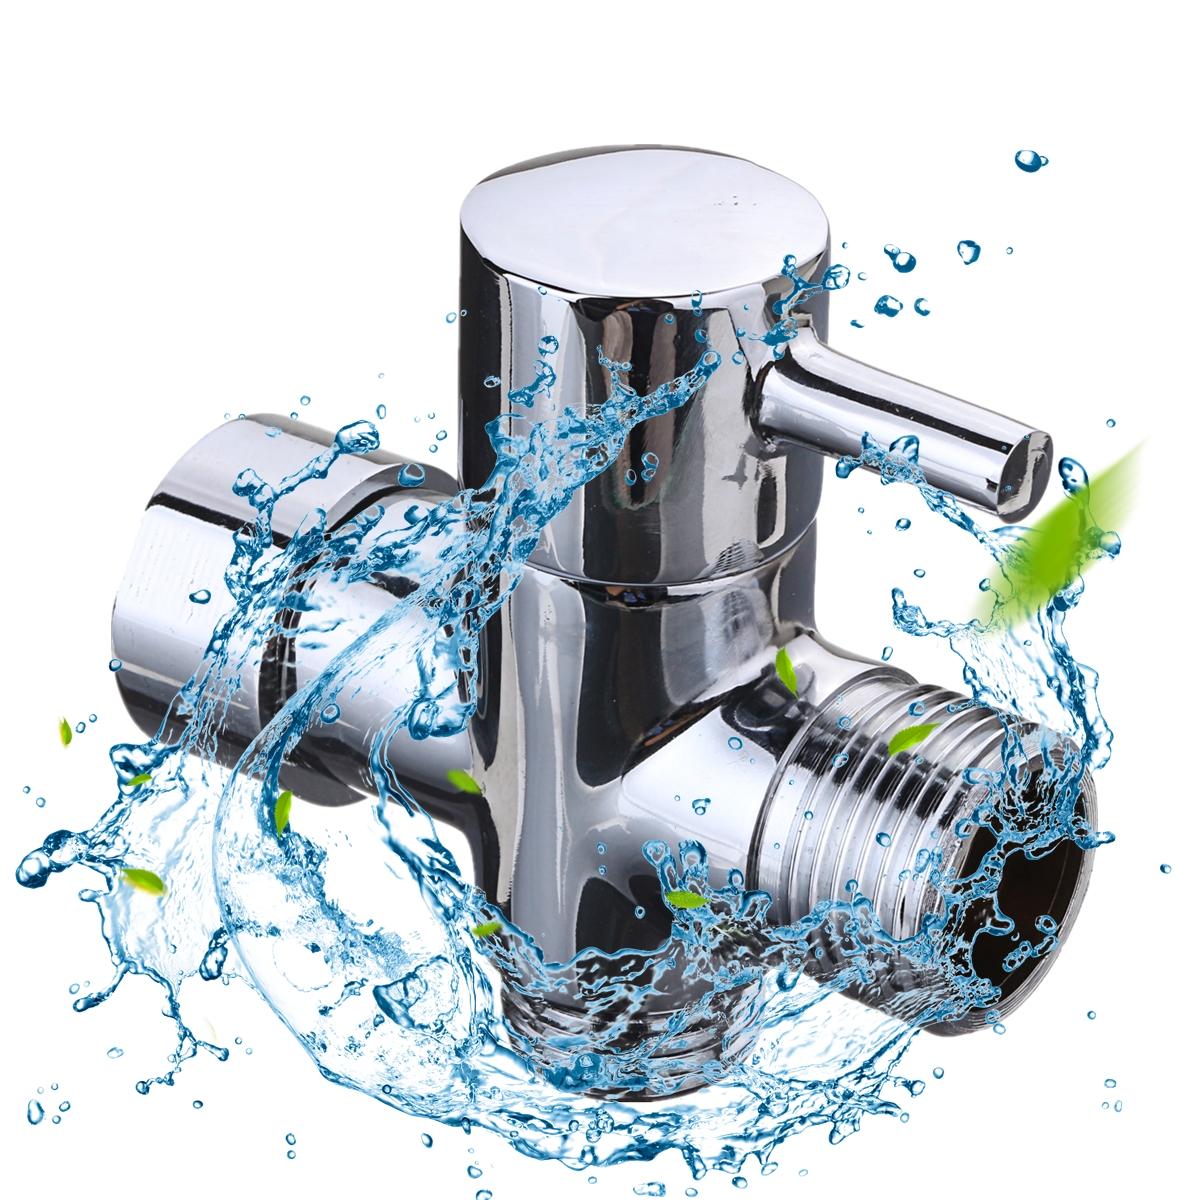 Toilet Bathroom Hand Held  Diaper Sprayer Spray Hose Holder with Valve adapter